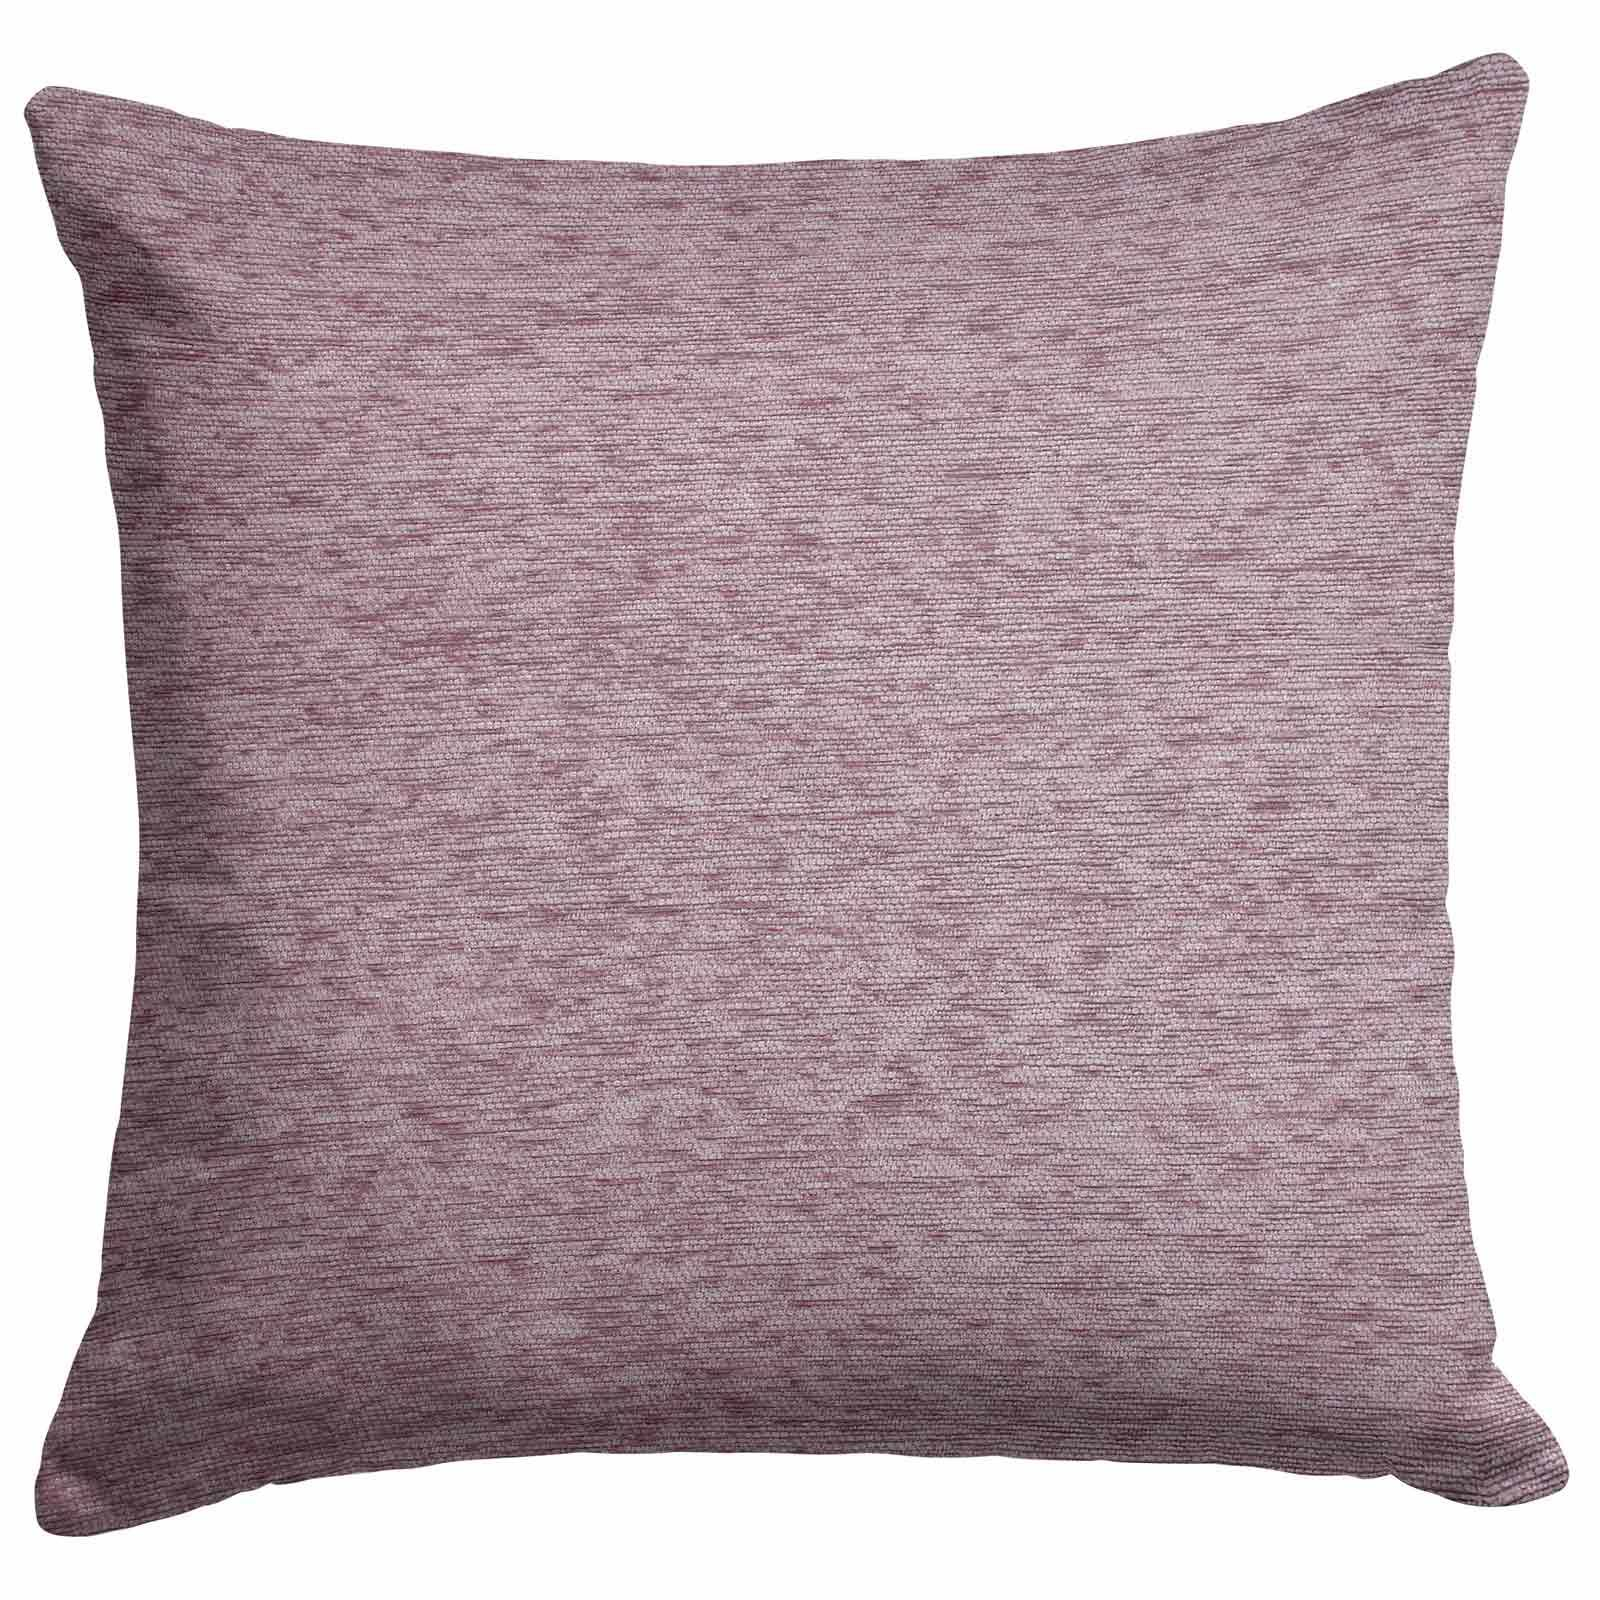 Set-of-2-Chenille-Cushion-Covers-Luxury-Plain-Cushions-Cover-Pairs-18-034-x-18-034 thumbnail 5